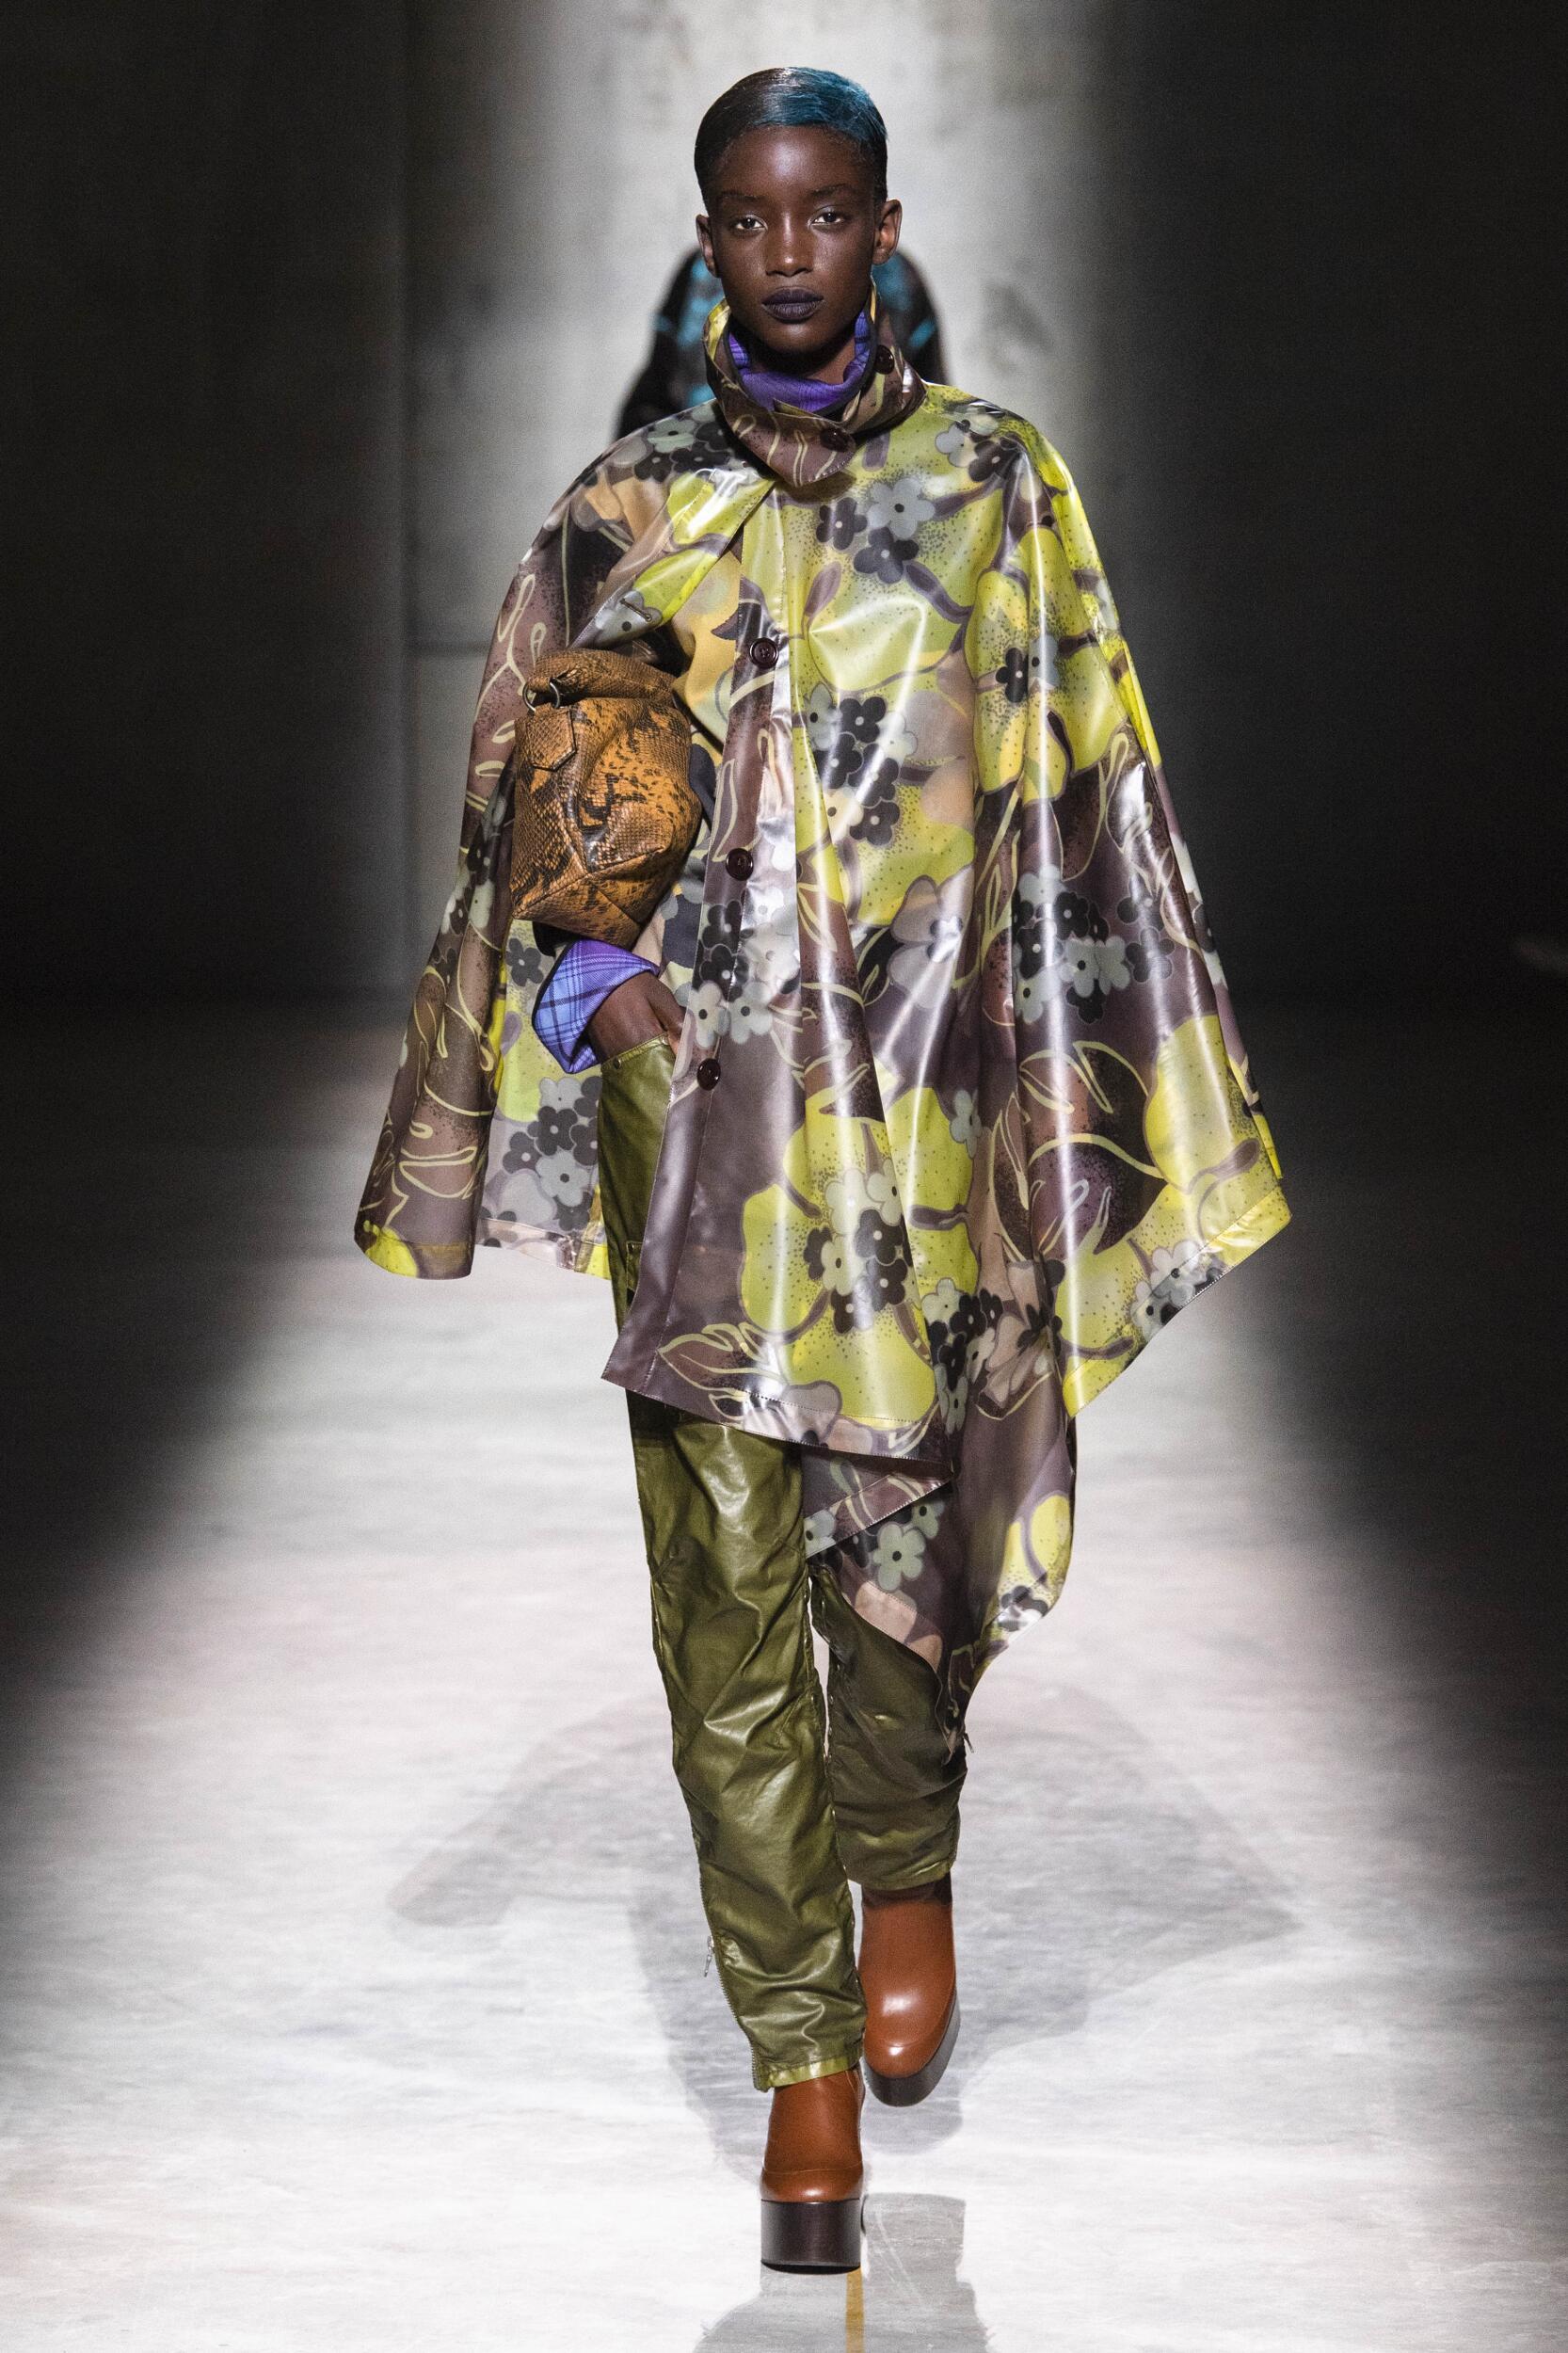 Runway Dries Van Noten Fall Winter 2020 Women's Collection Paris Fashion Week